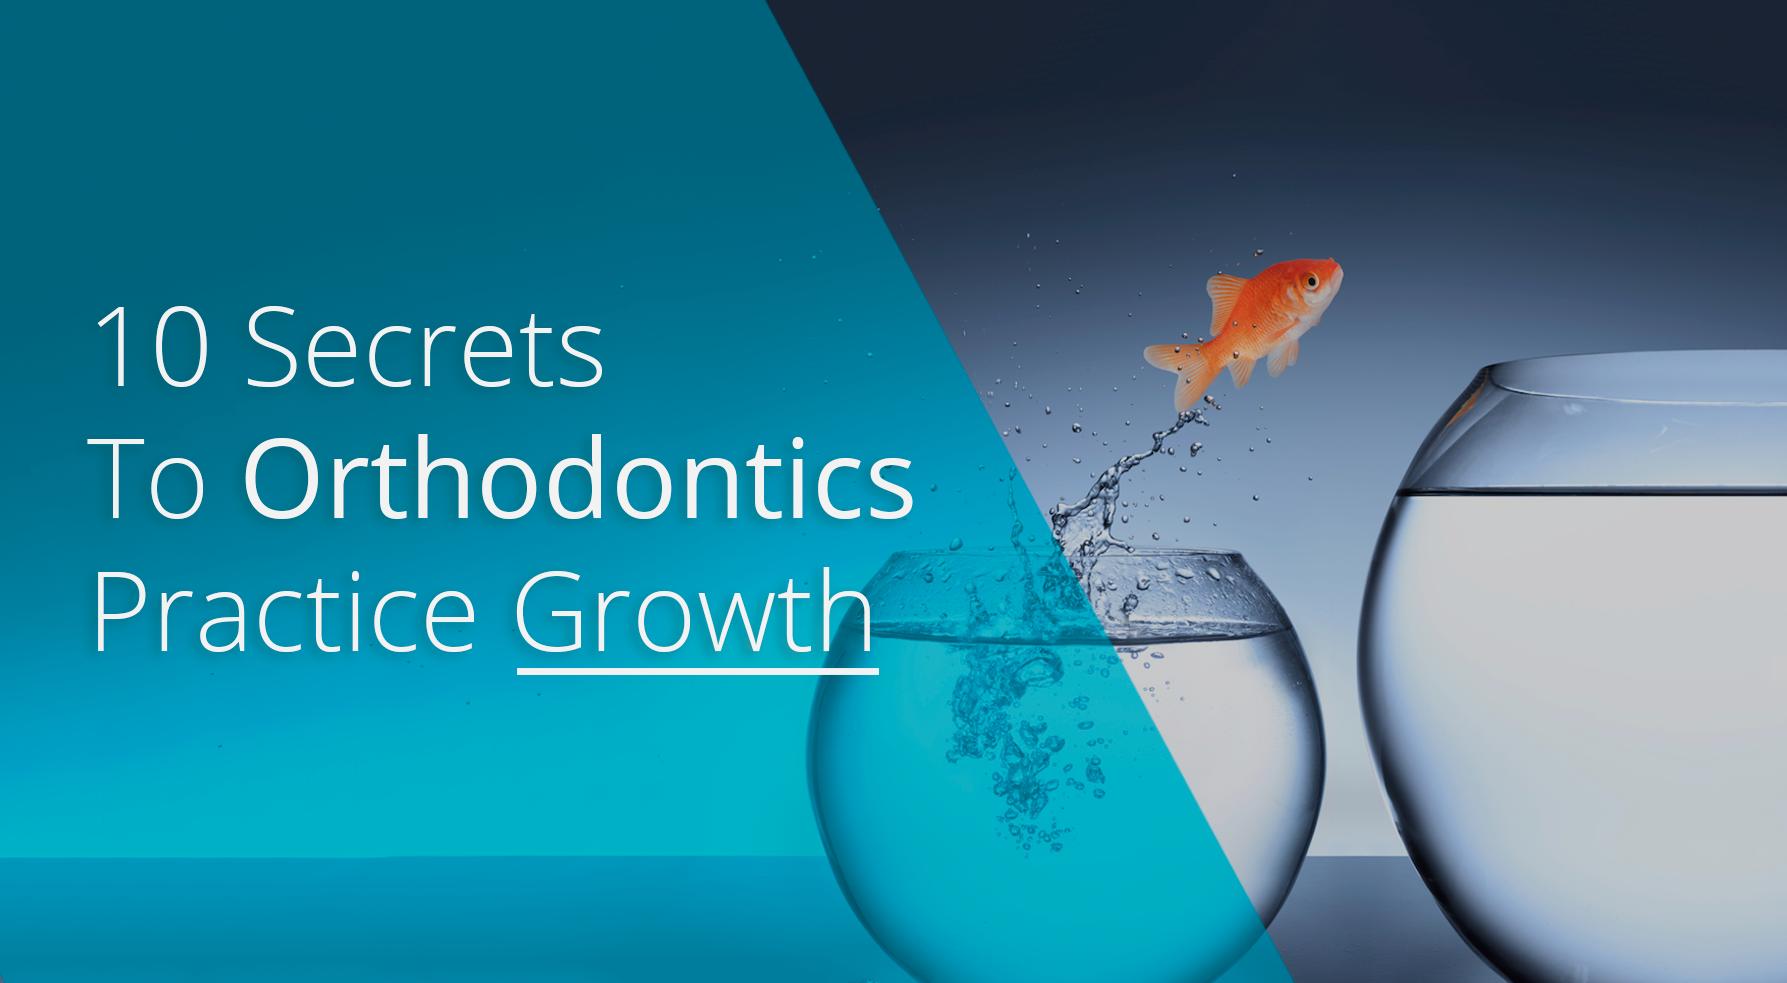 10 Secrets To Orthodontic Practice Growth